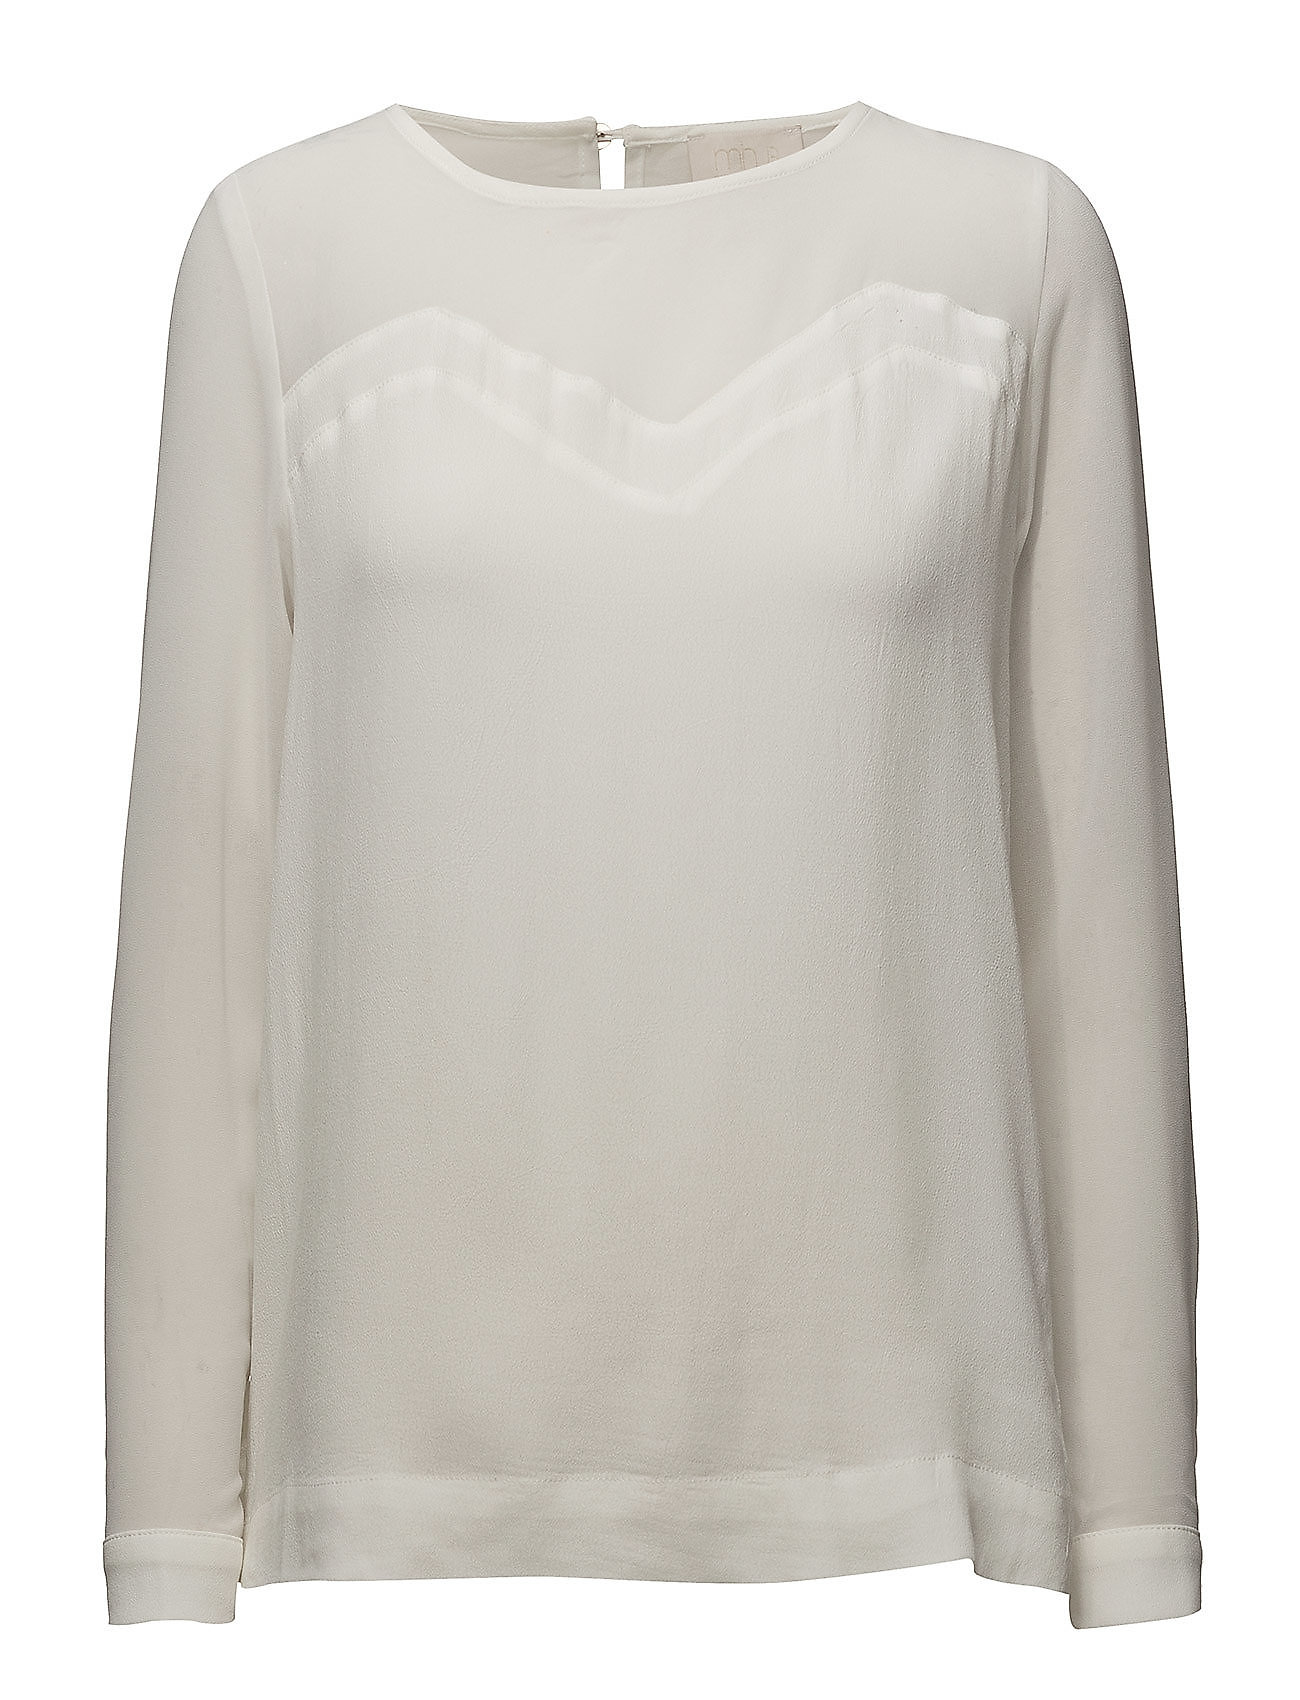 Minus Charles blouse